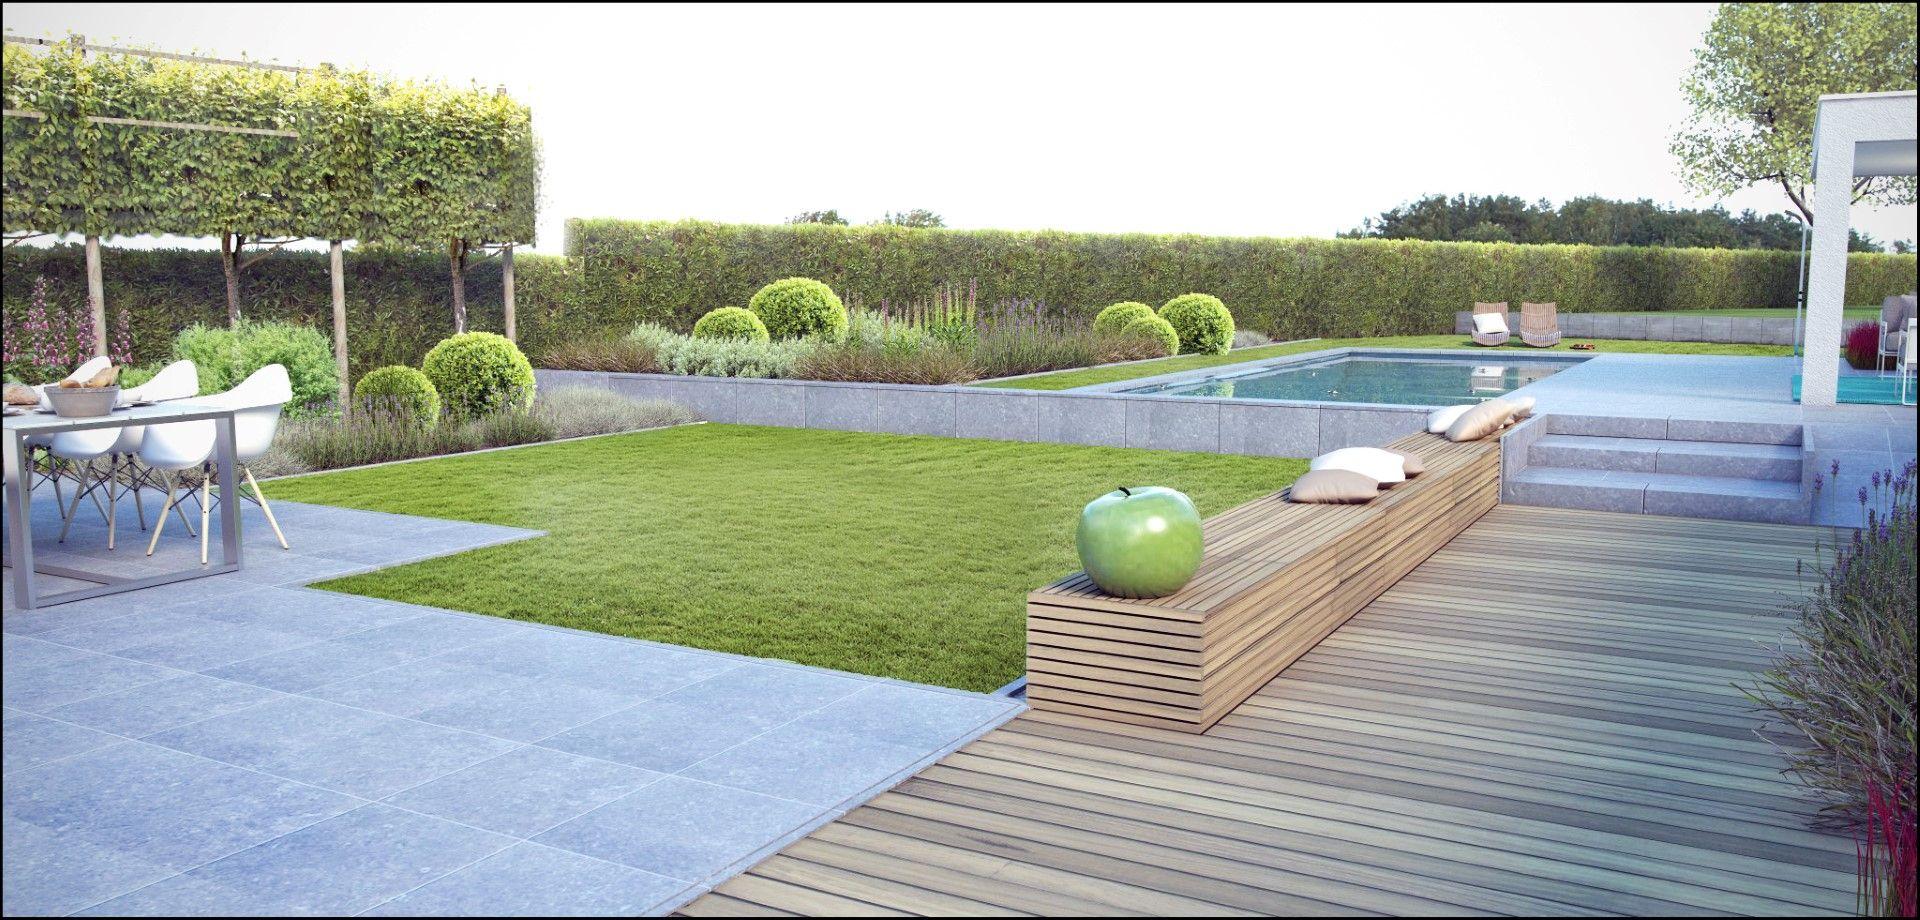 Chicgarden recherche google d co maison pinterest for Paisajismo terrazas